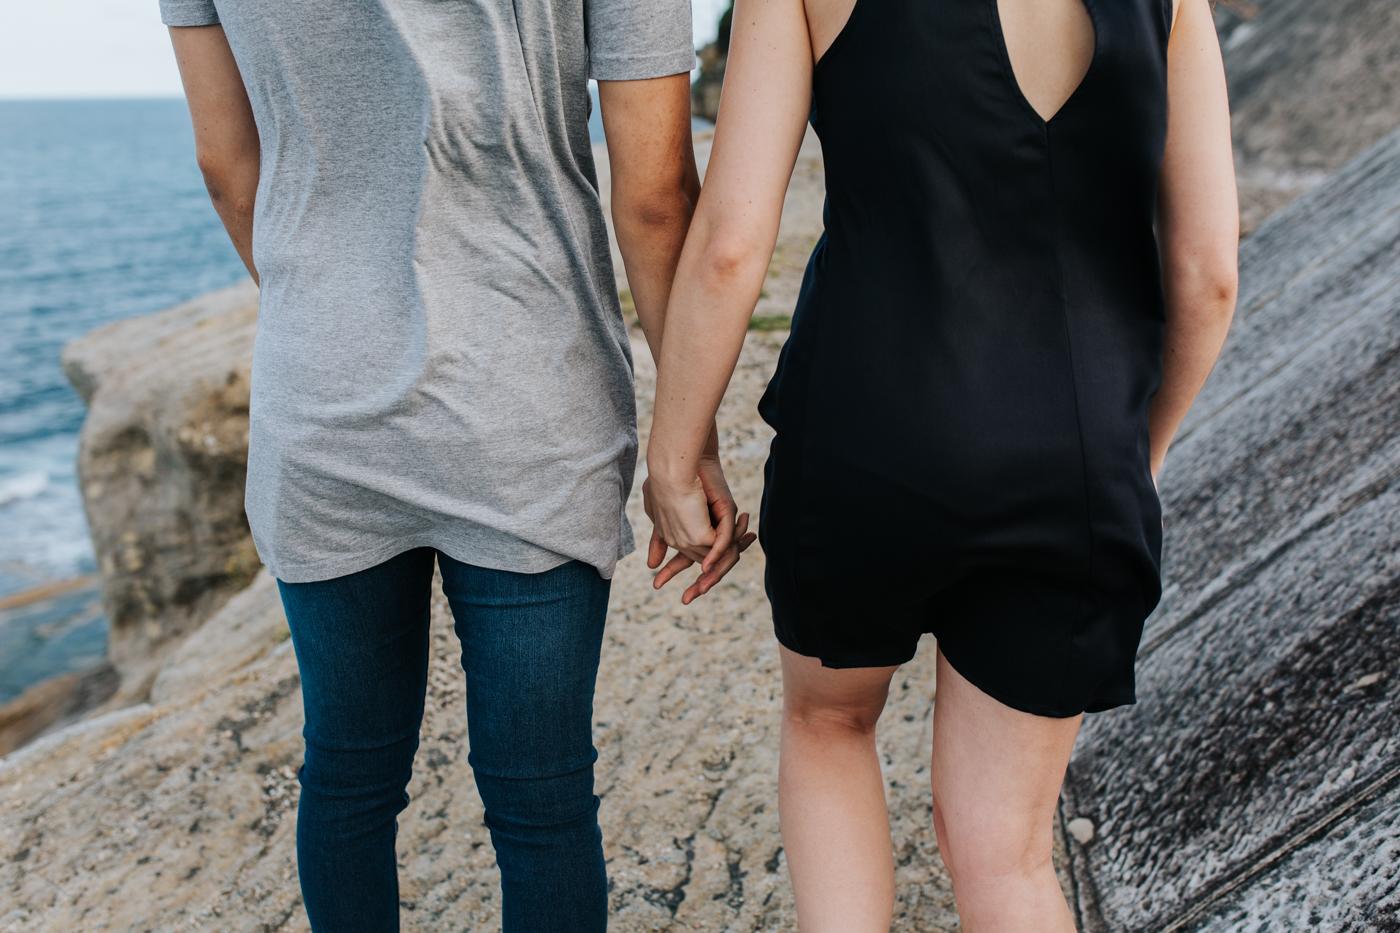 James & Caitie Engagement - Watsons Bay - Samantha Heather Photography-4.jpg